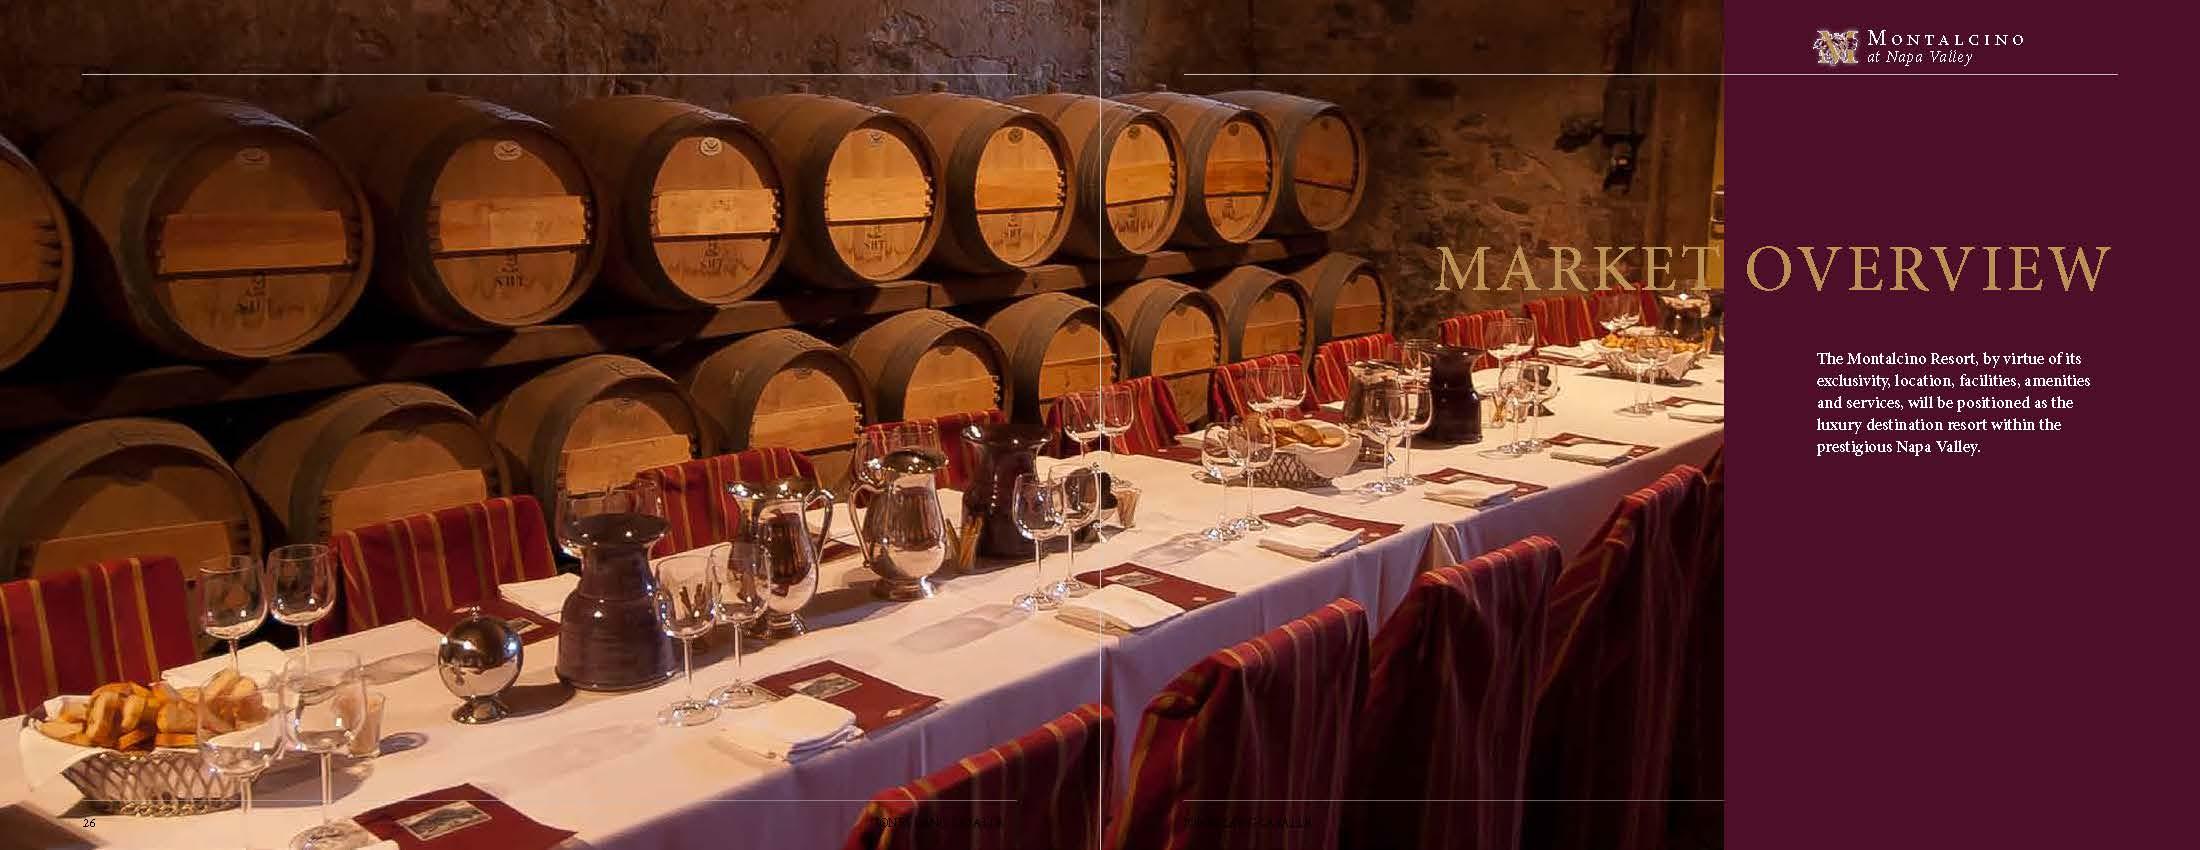 Montalcino OM 0619 spreads_Page_14.jpg